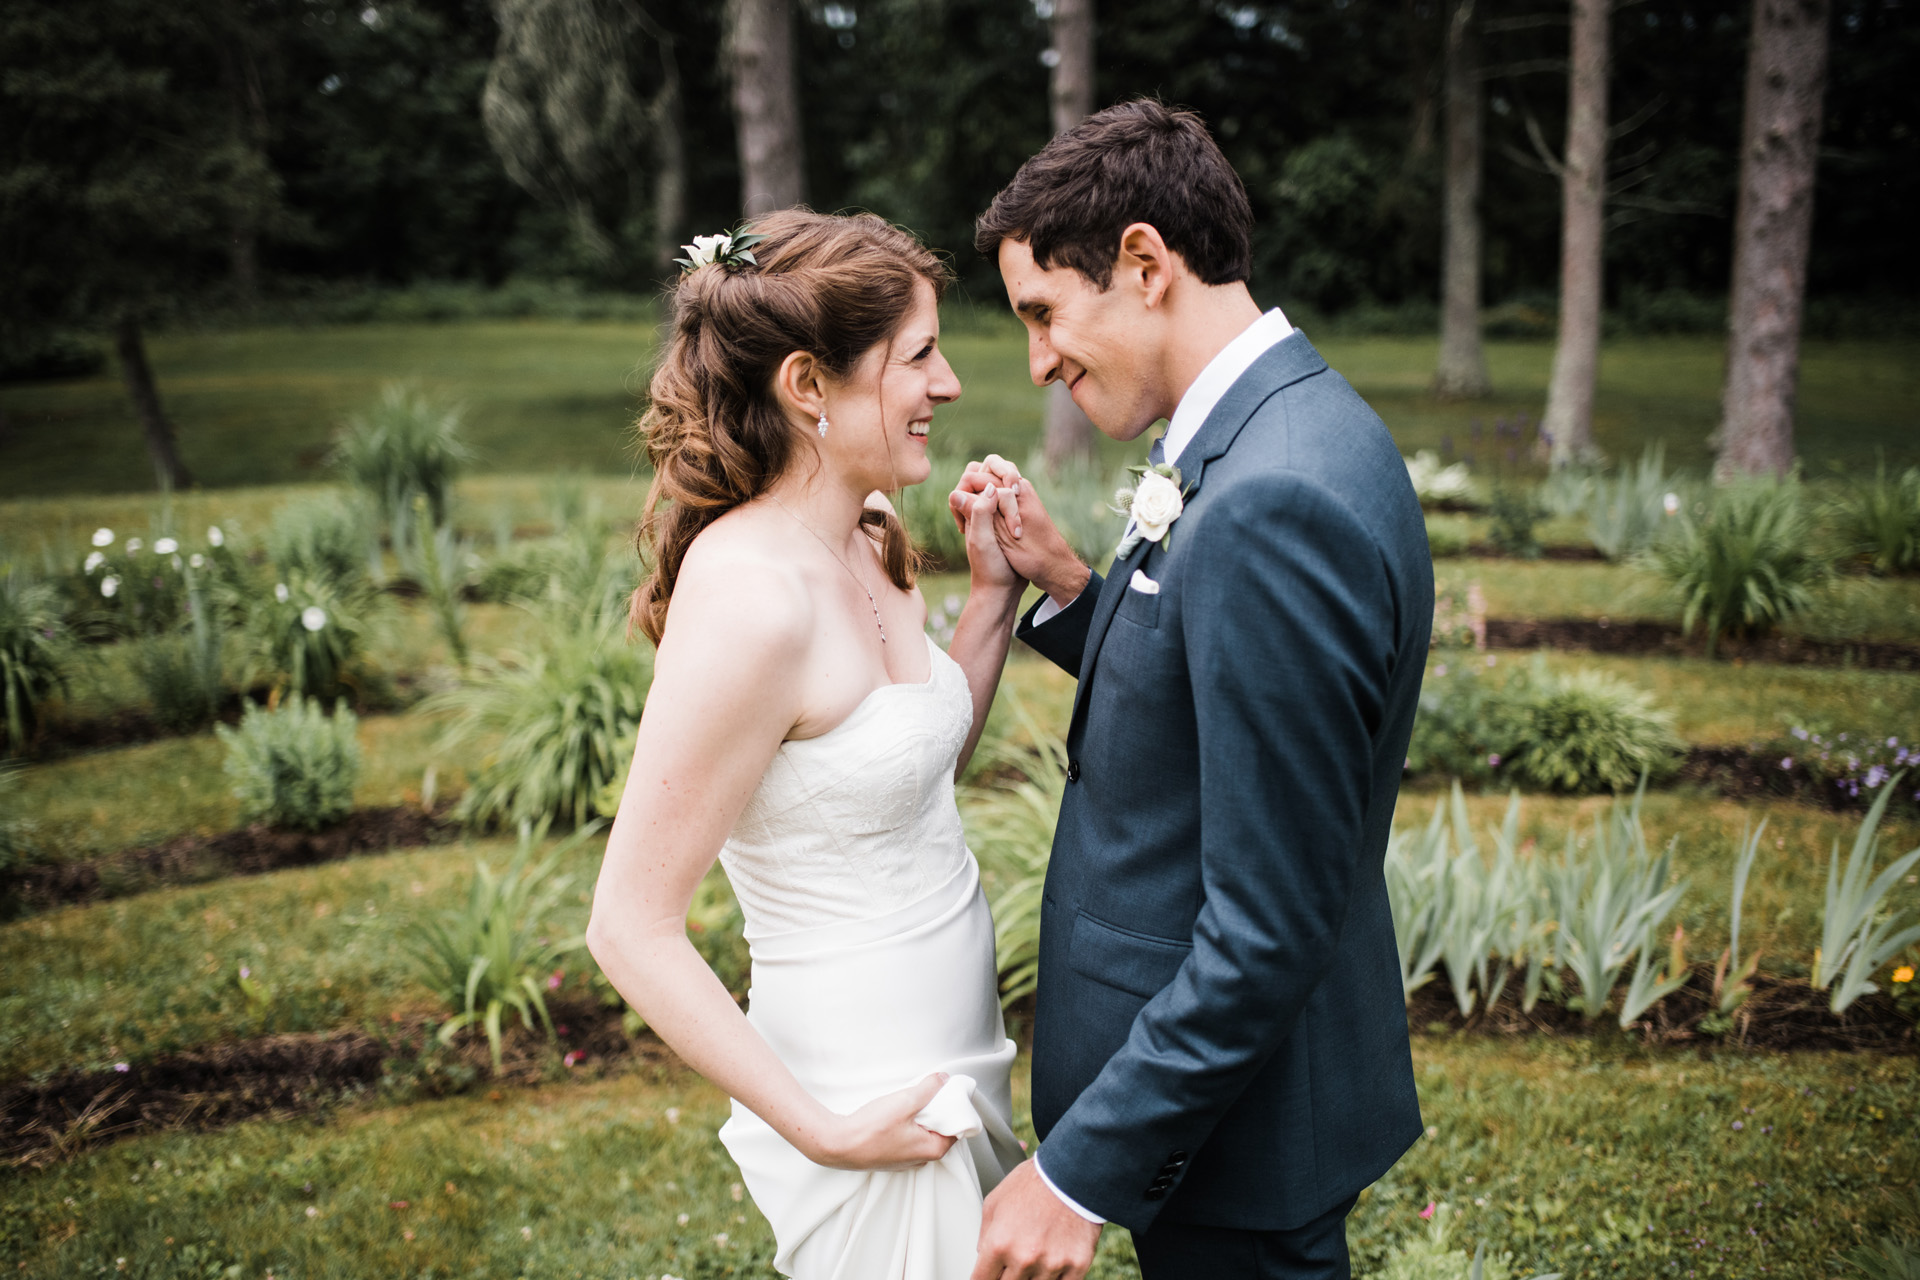 west-mountain-inn-wedding-vermont-18